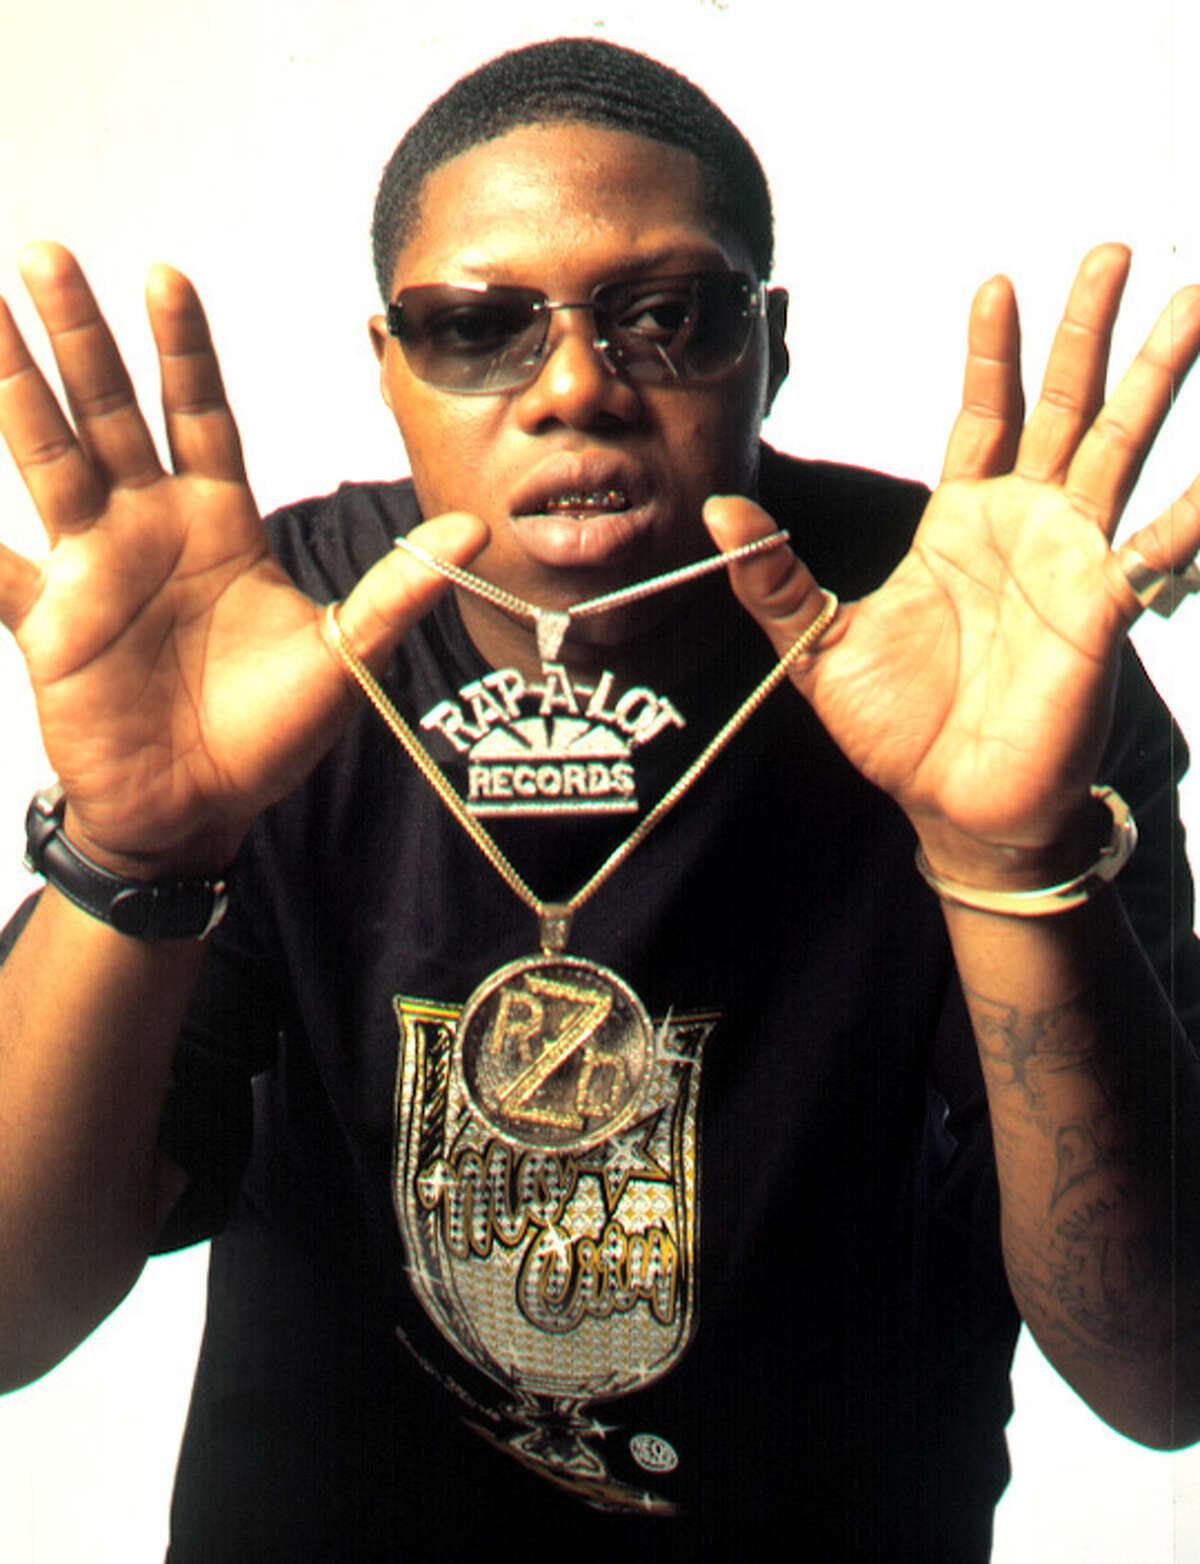 Houston rapper Z-Ro, real name Joseph Mcvey